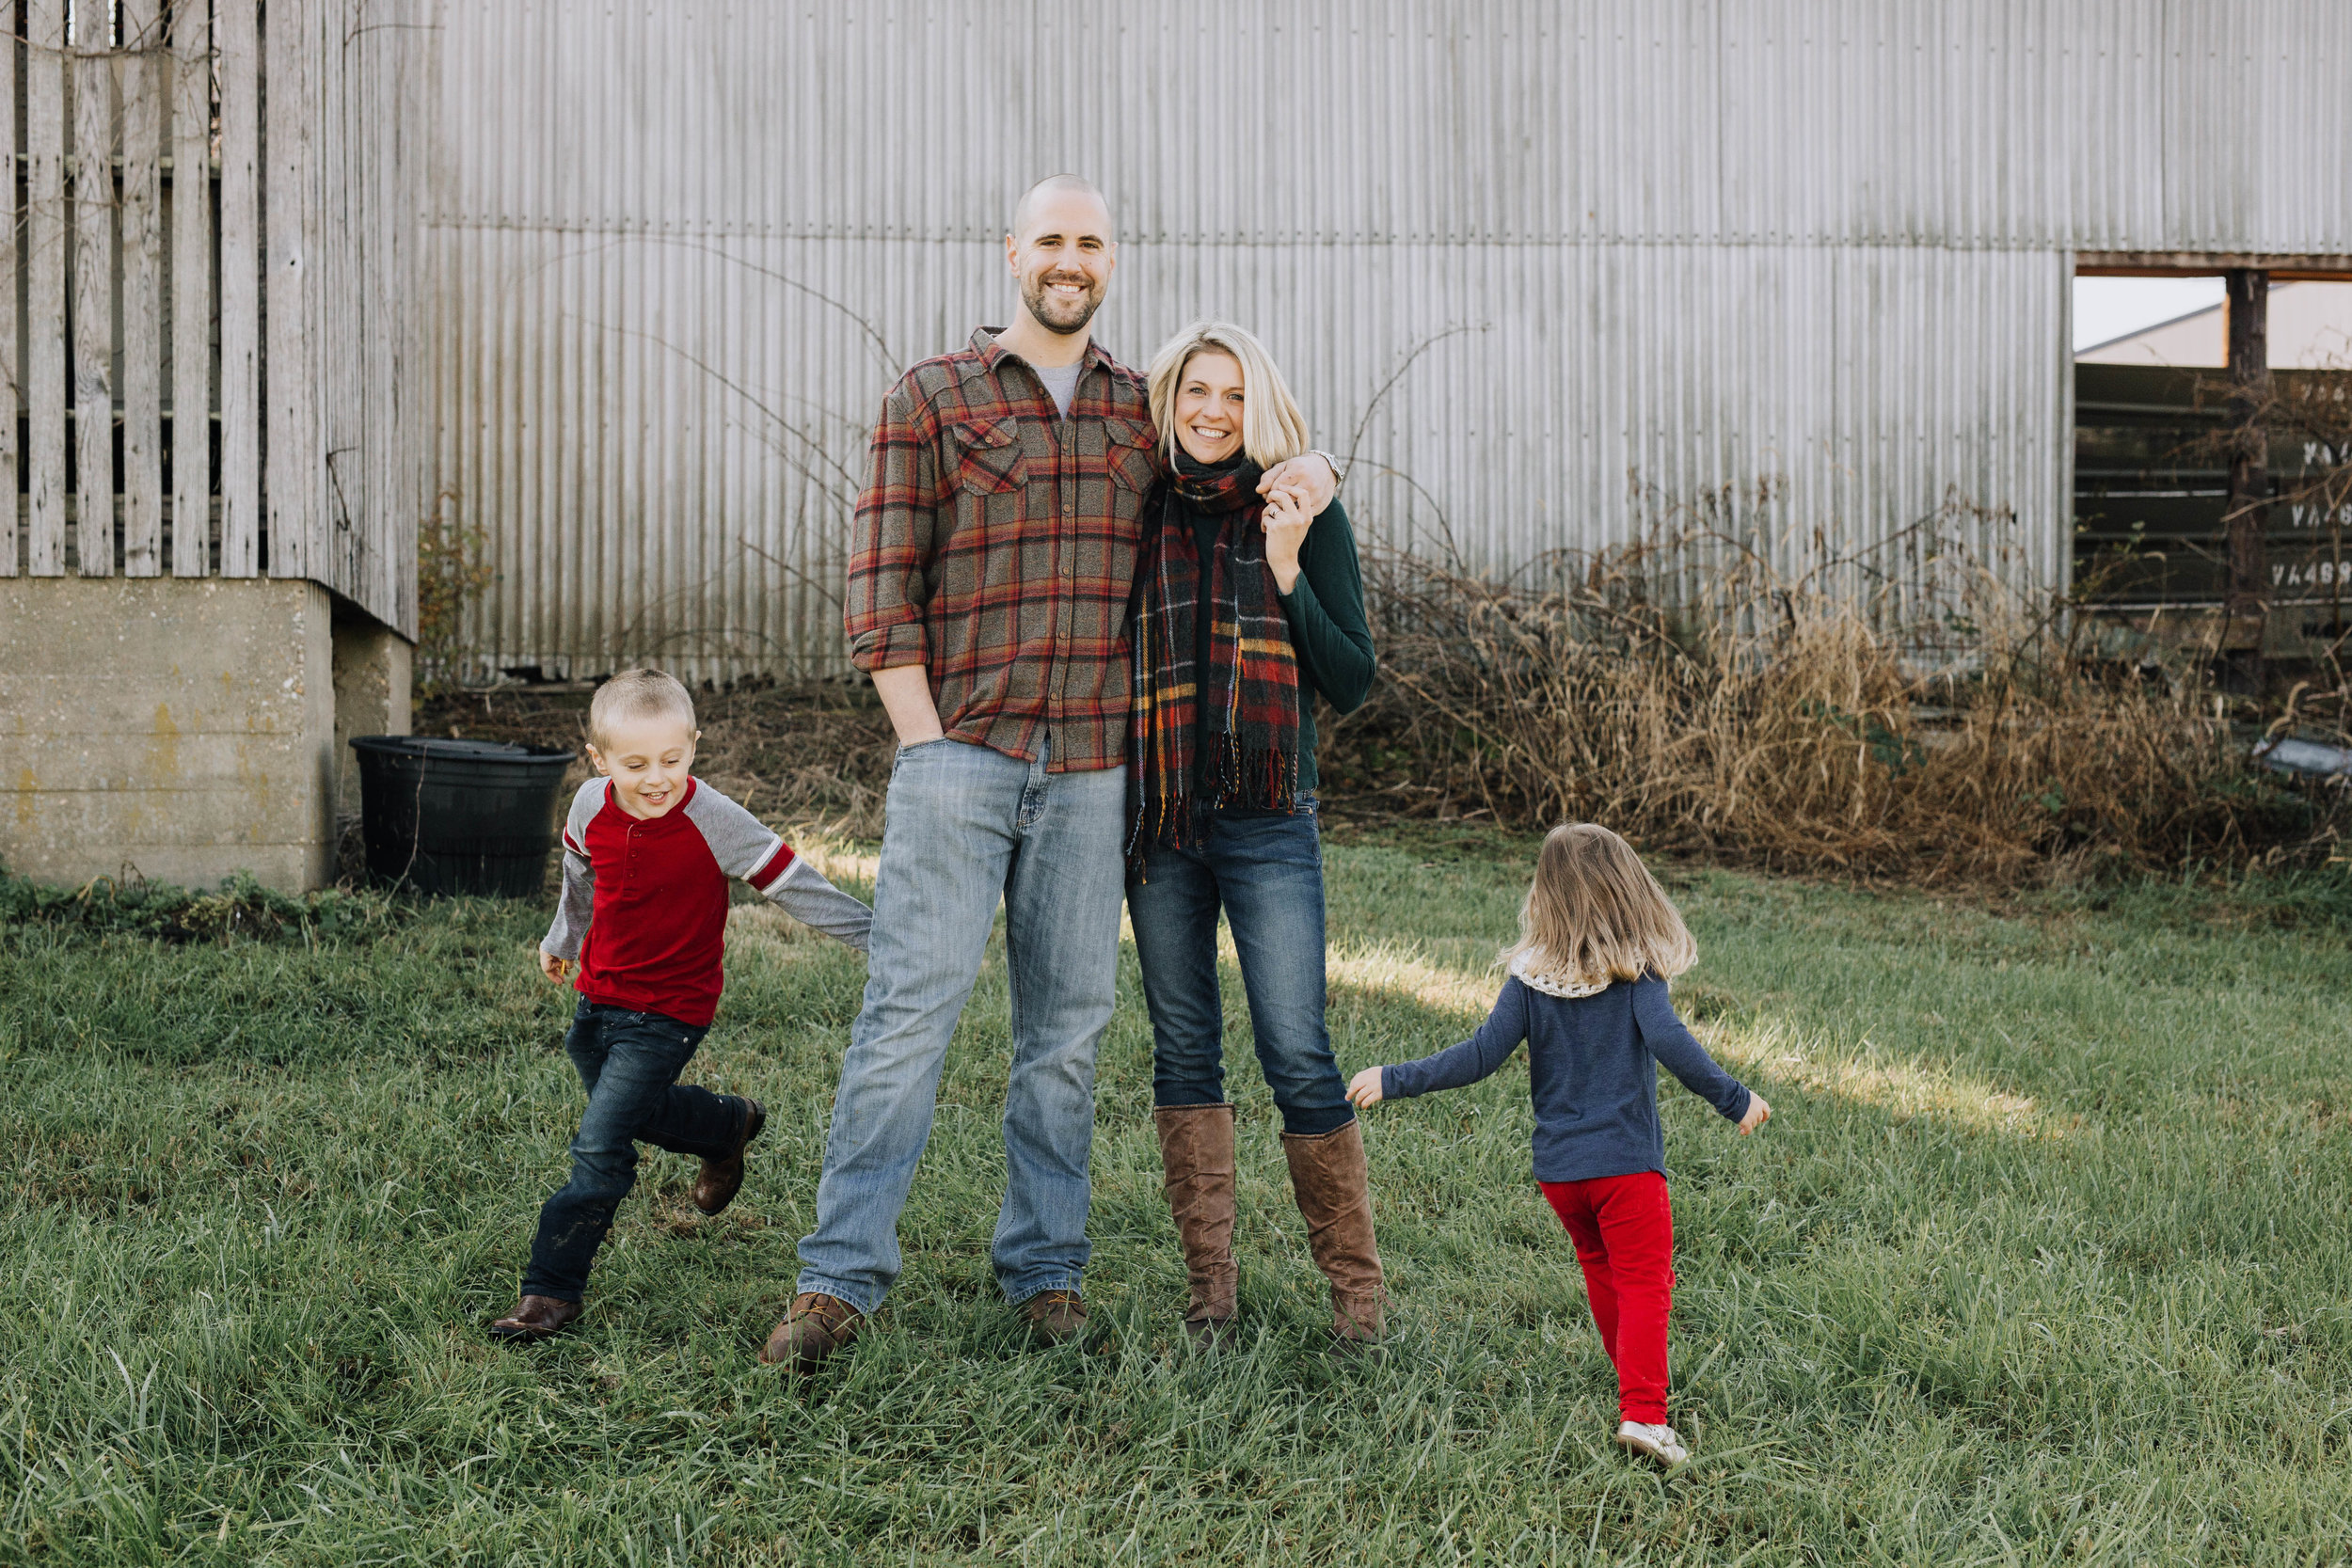 Lick_Run_Fredericksburg_Virginia_Jacqueline_Waters_Photography_Basham_Family_Portraits (144).jpg